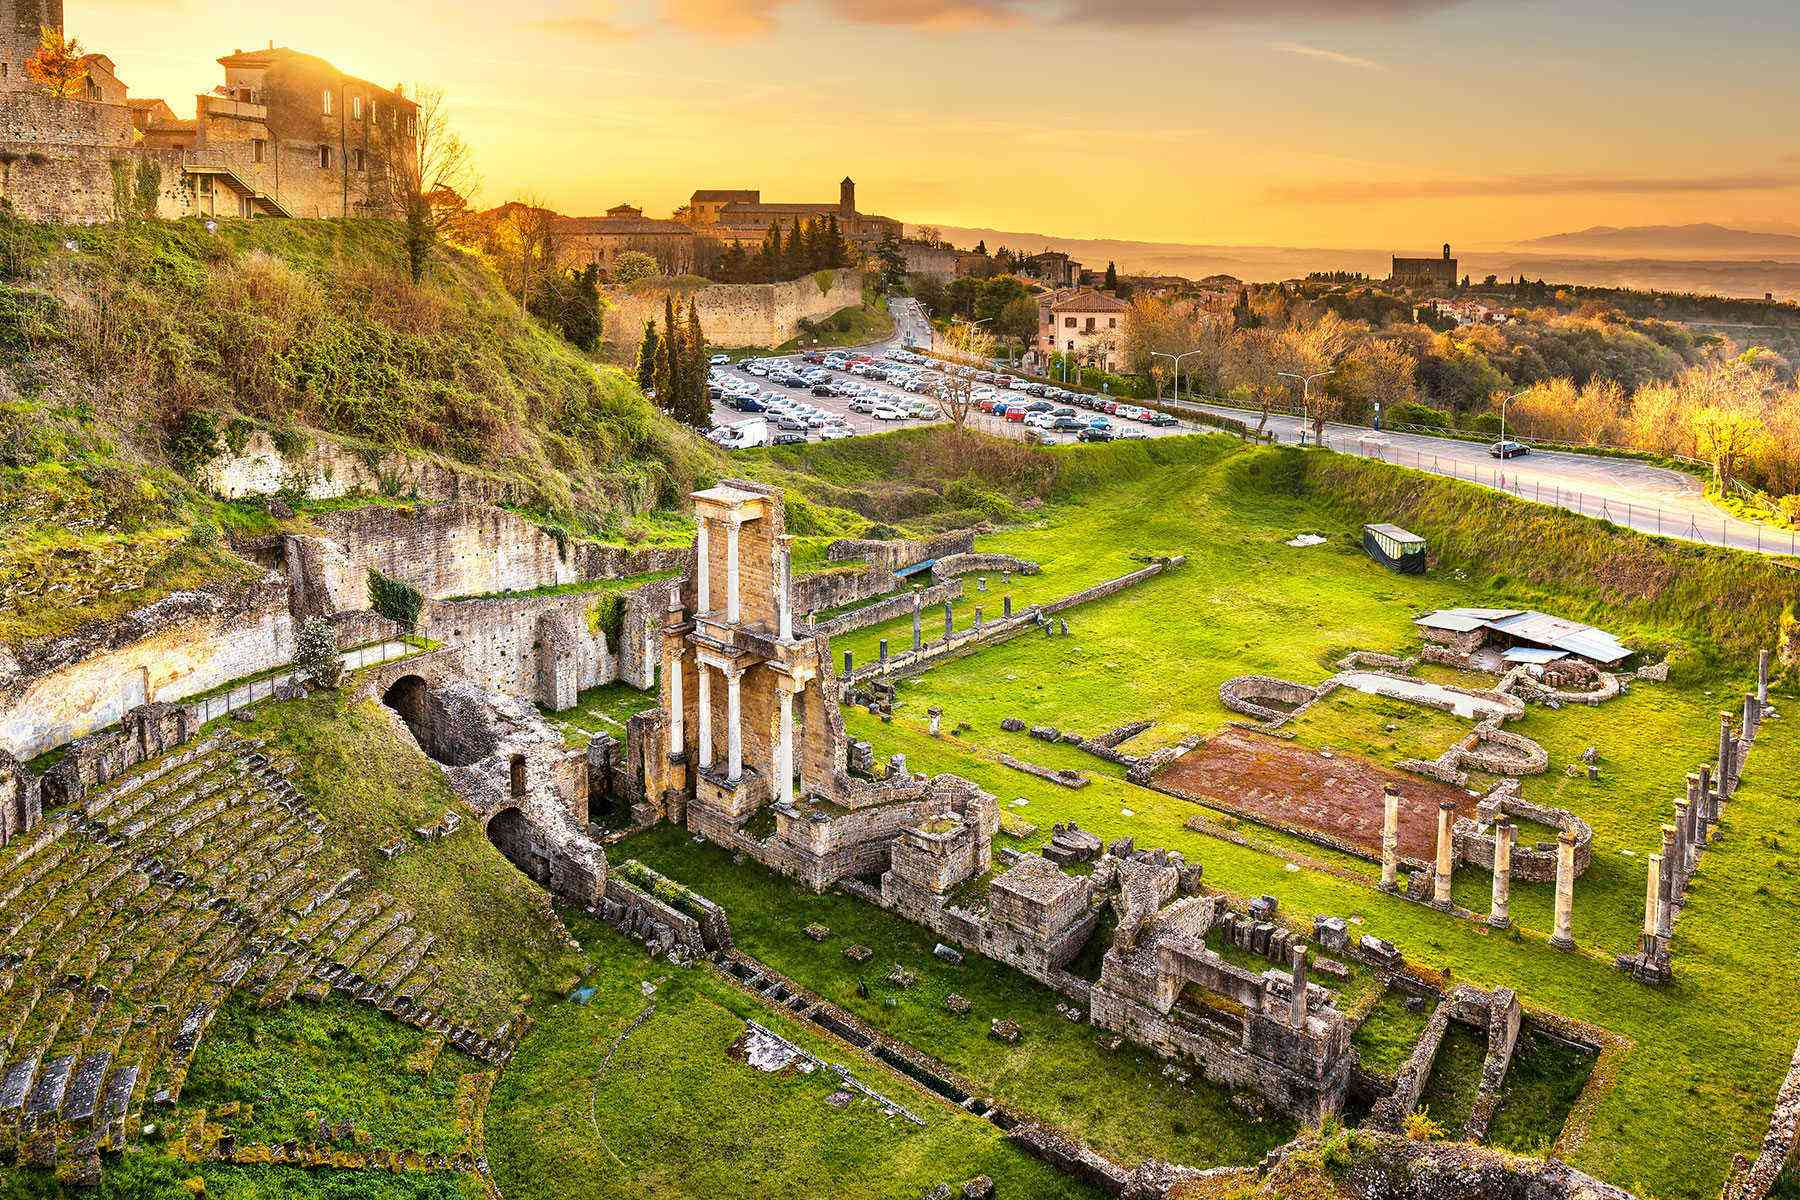 Medieval-Italian-Towns-Volterra-3